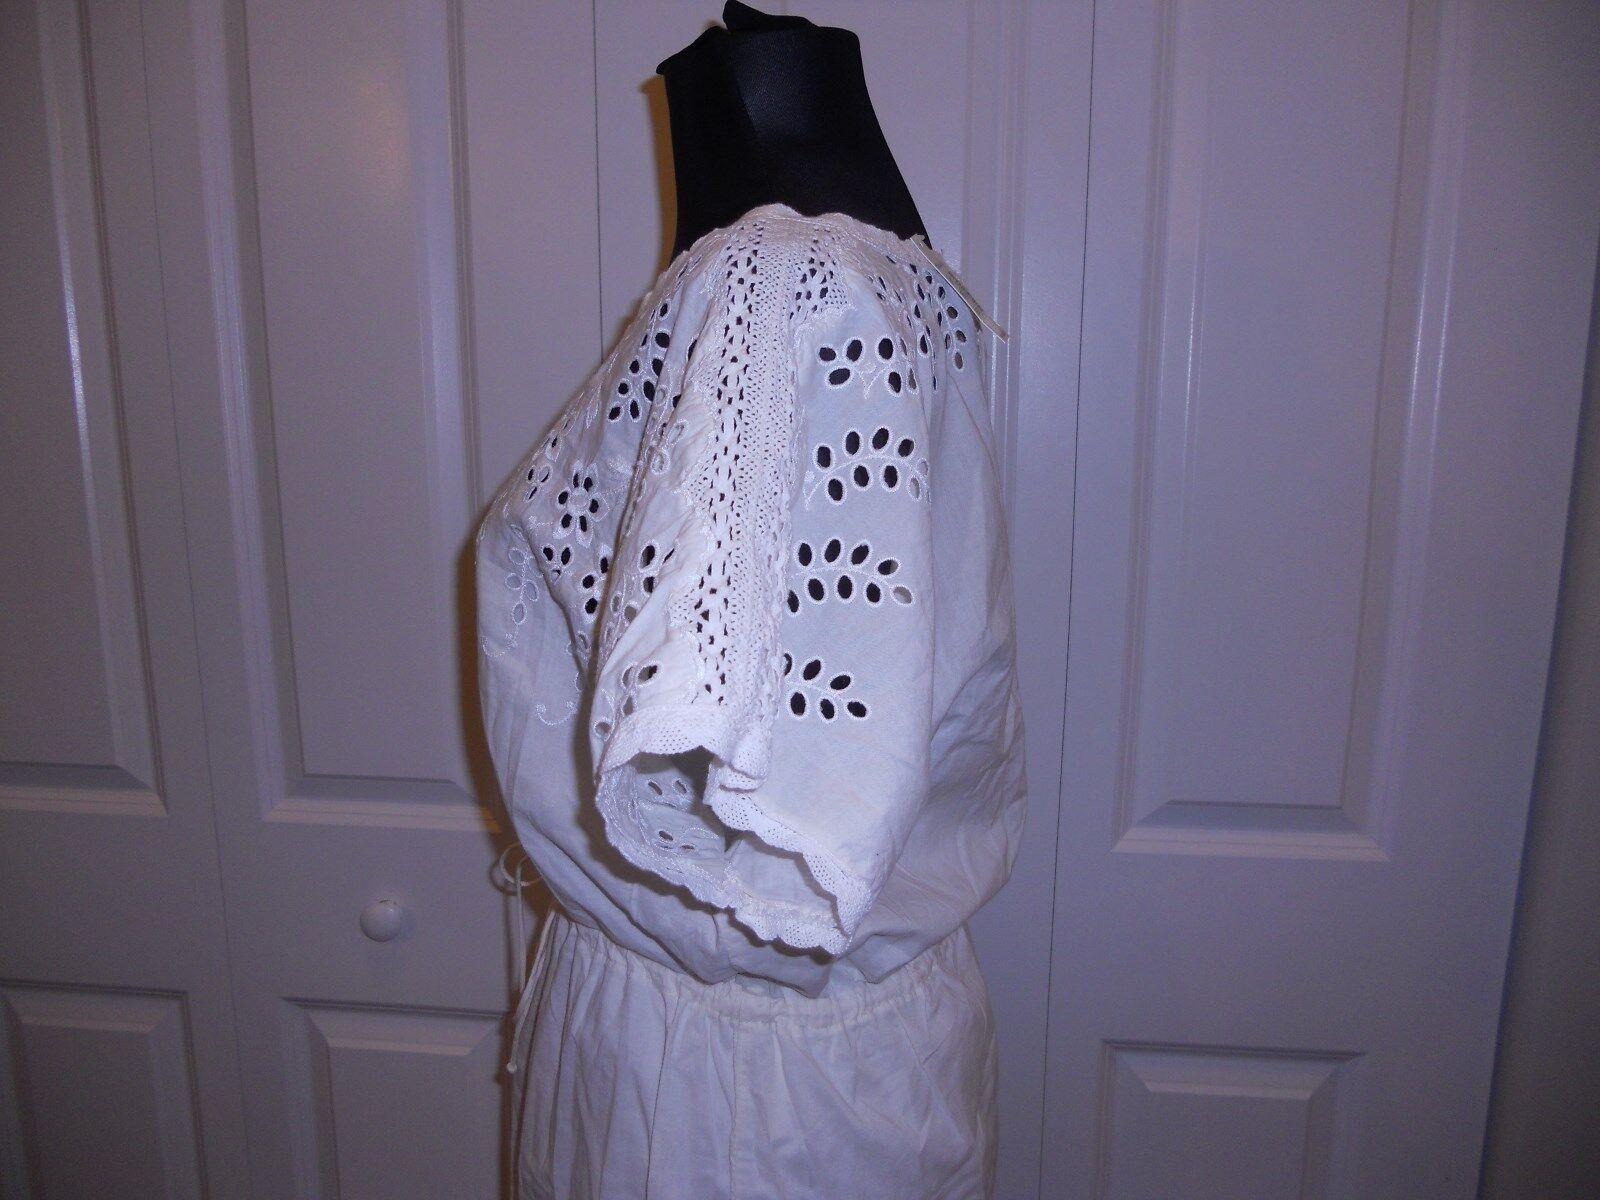 NWT MADEWELL 1937 EYELET WILDFIELD DRESS IN CREAM CREAM CREAM SIZE 12 e4ccb5